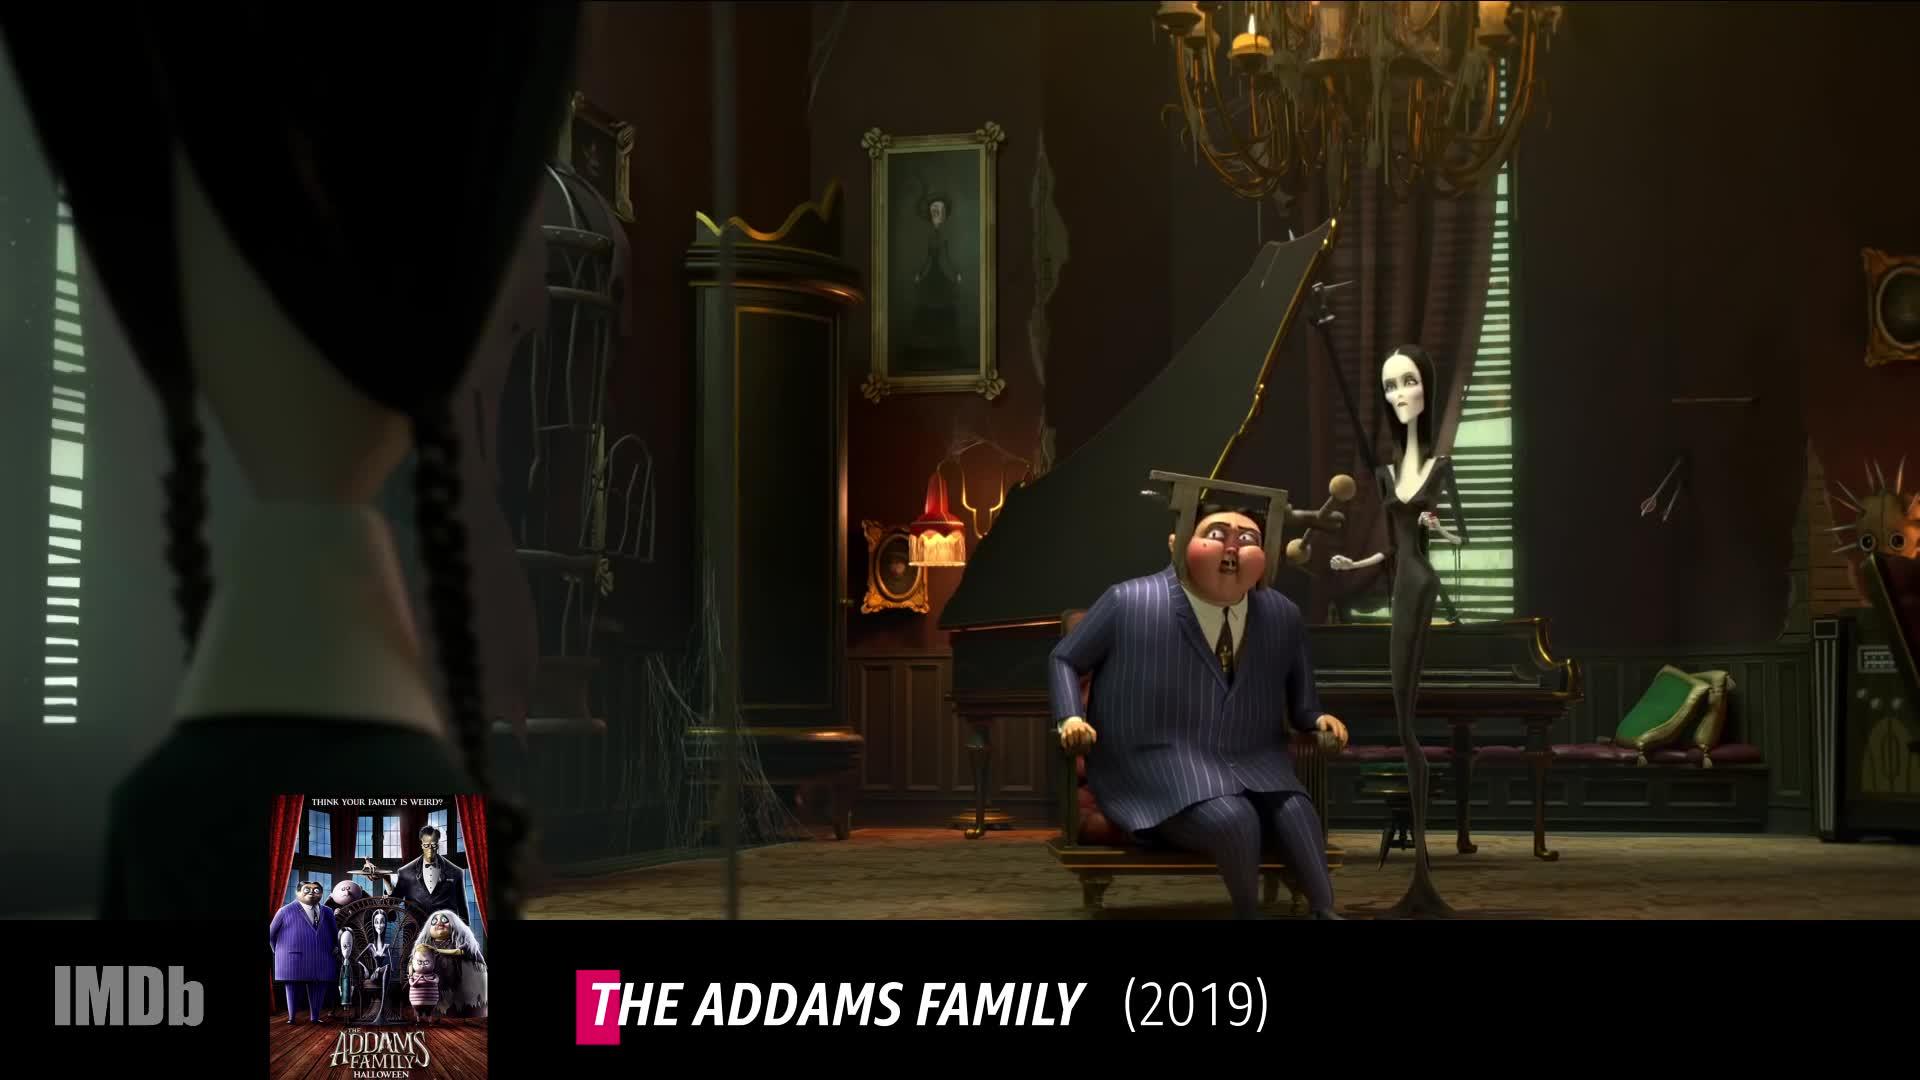 addams family reunion (1998) trailer